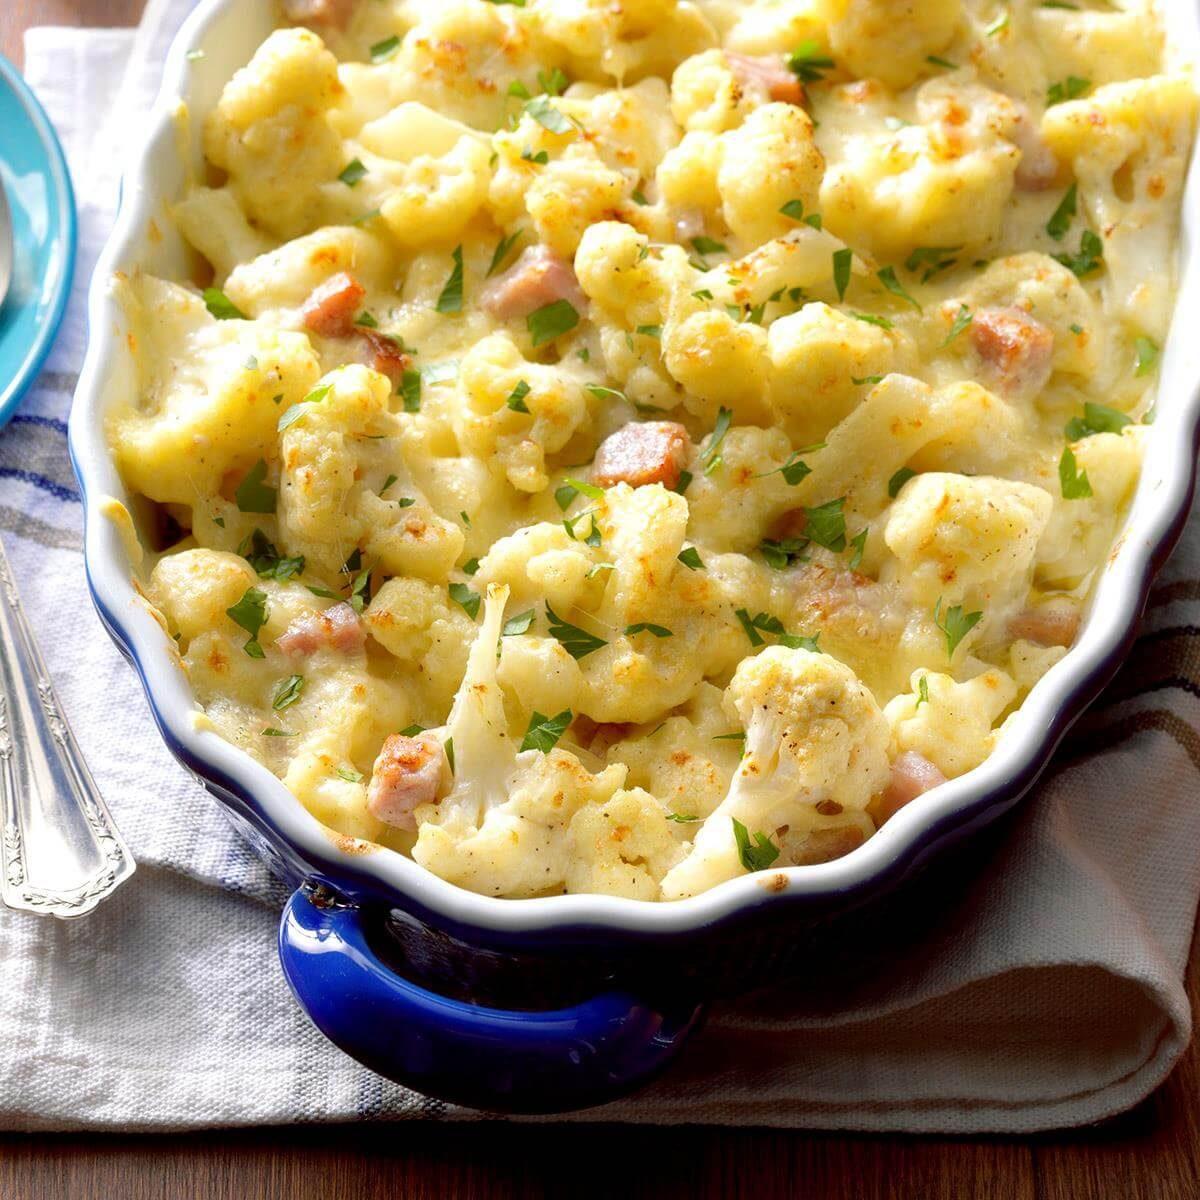 A casserole dish filled with Cauliflower Au Gratin